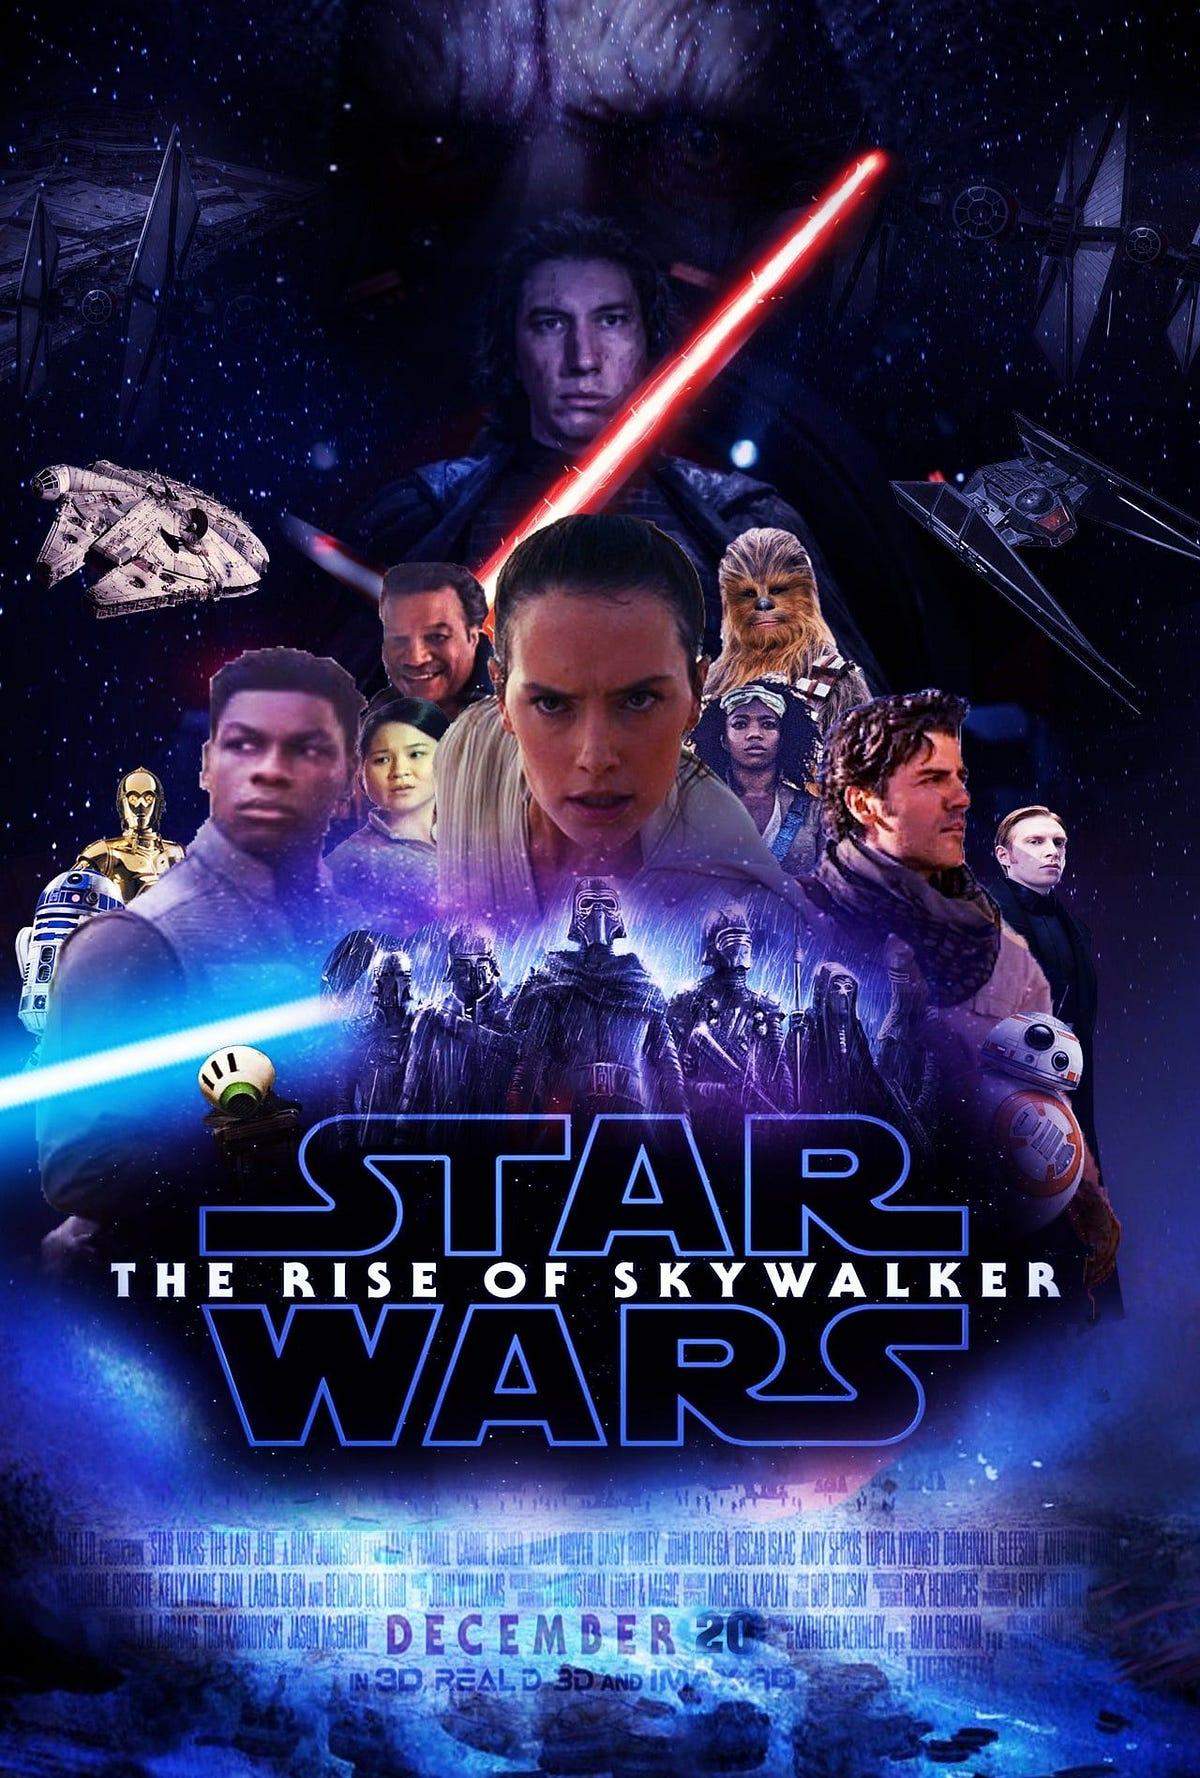 Star Wars 2 L'attaque Des Clones Film Complet En Francais : l'attaque, clones, complet, francais, Wars:, L'ascension, Skywalker, ReGARder, ~Streaming~, Ligne, Français, Getaah, Medium